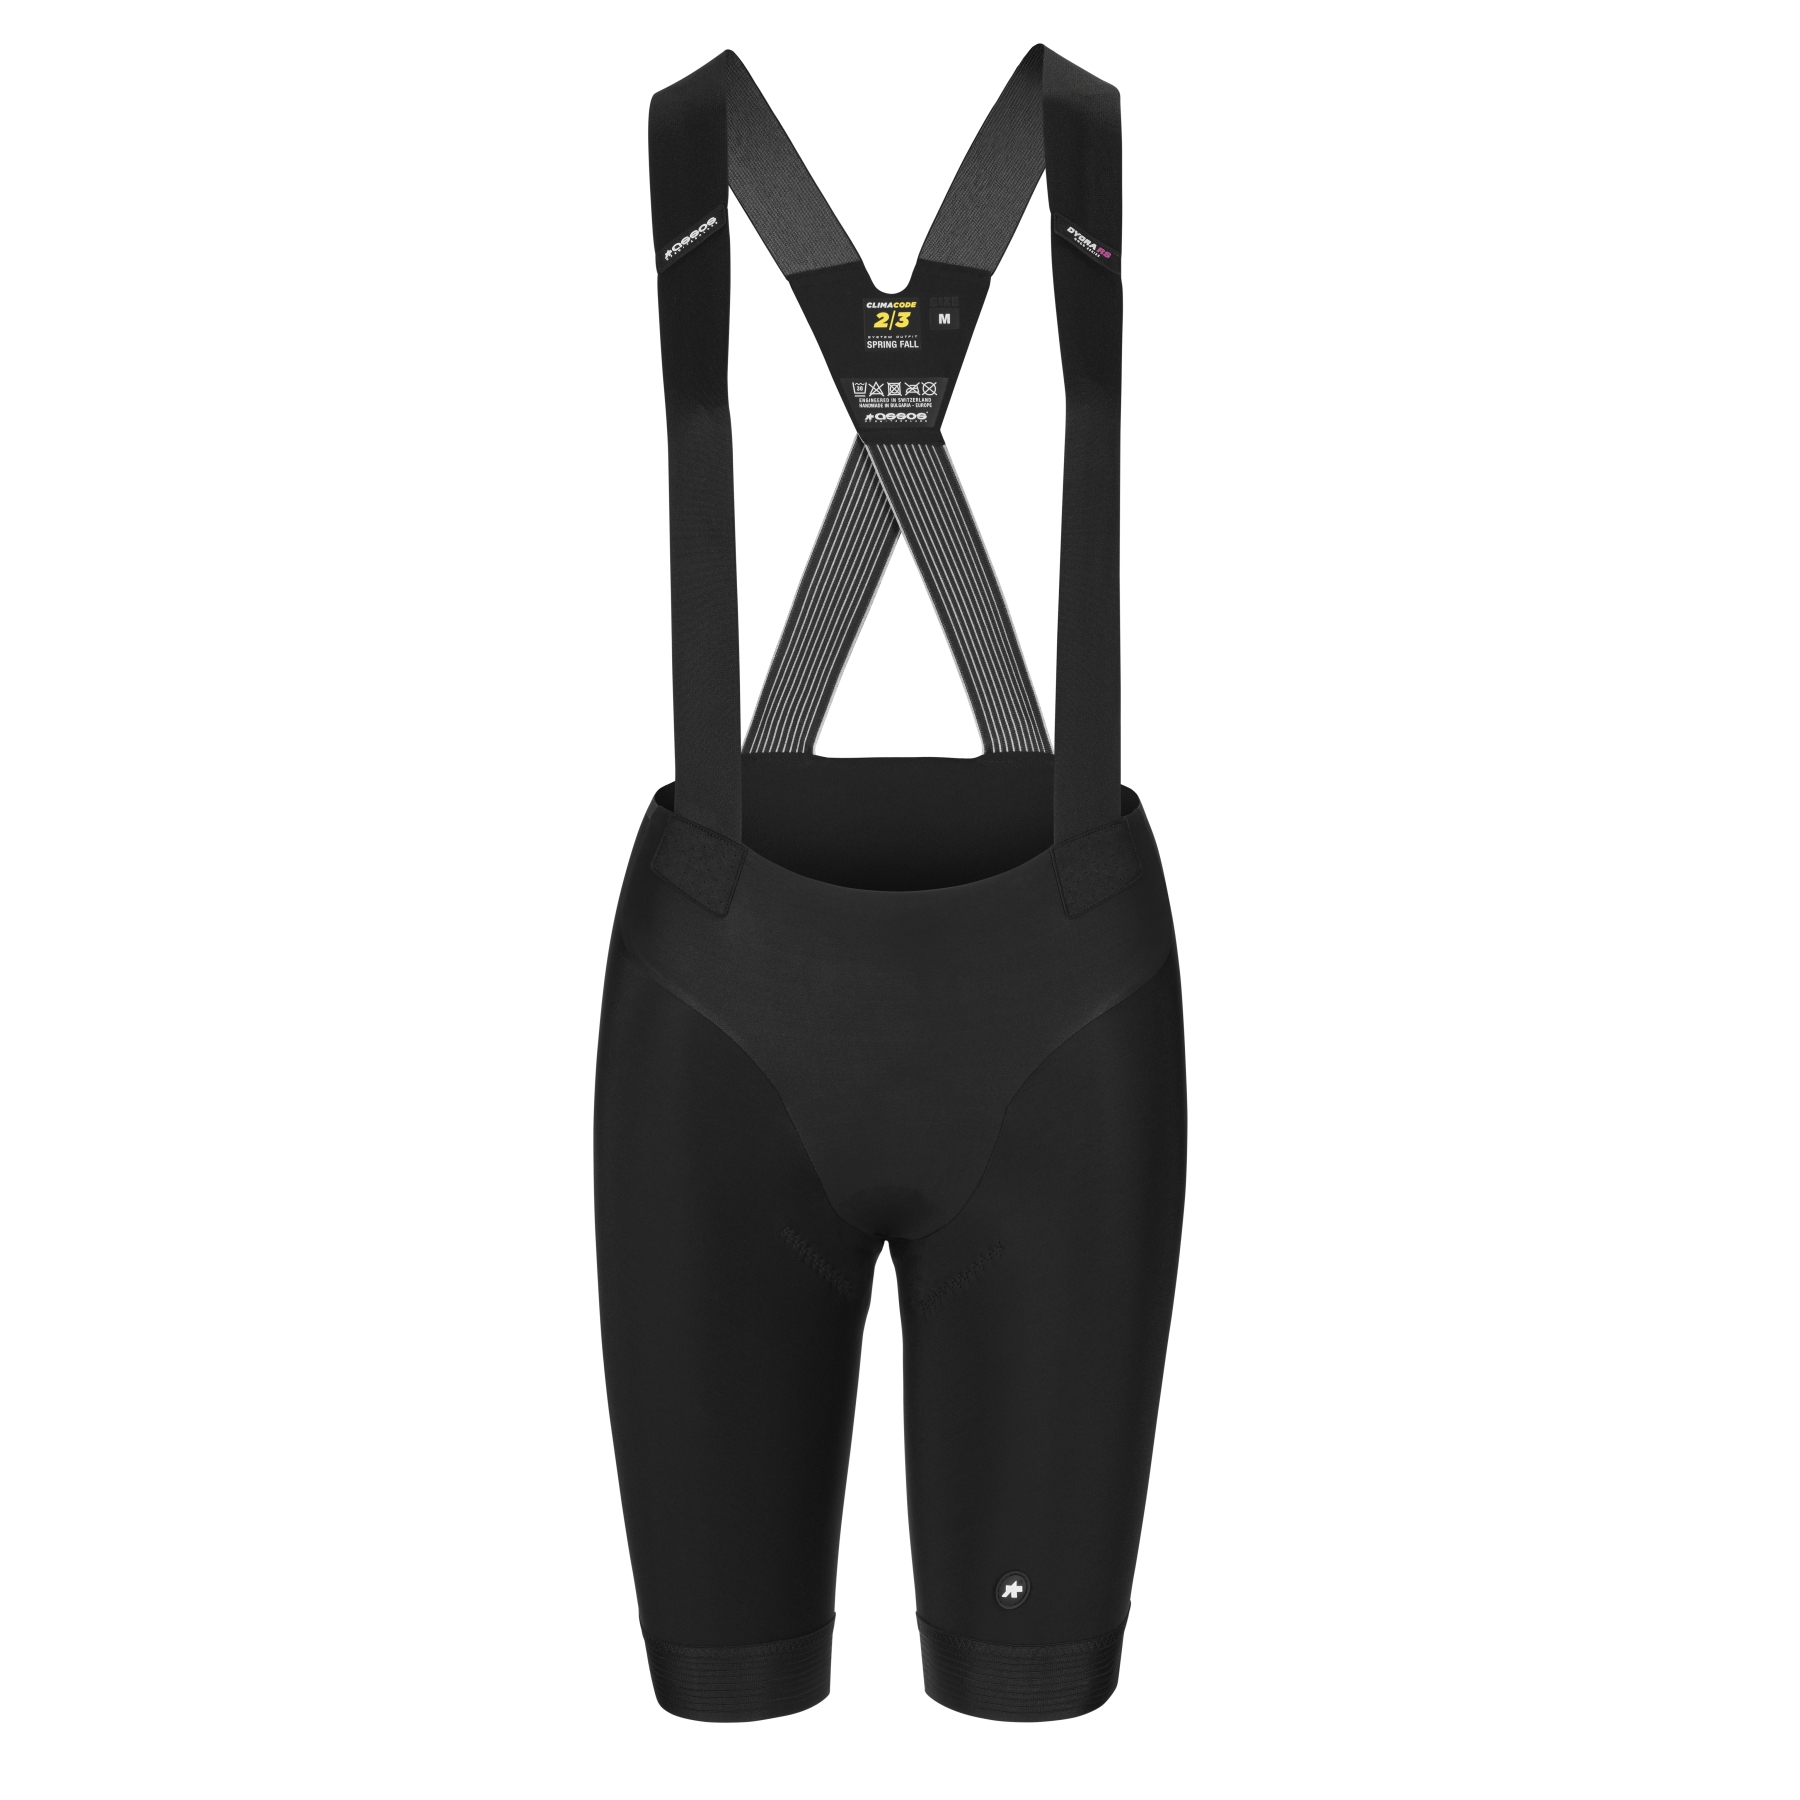 Bild von Assos DYORA RS Spring Fall Bib Shorts S9 - black series